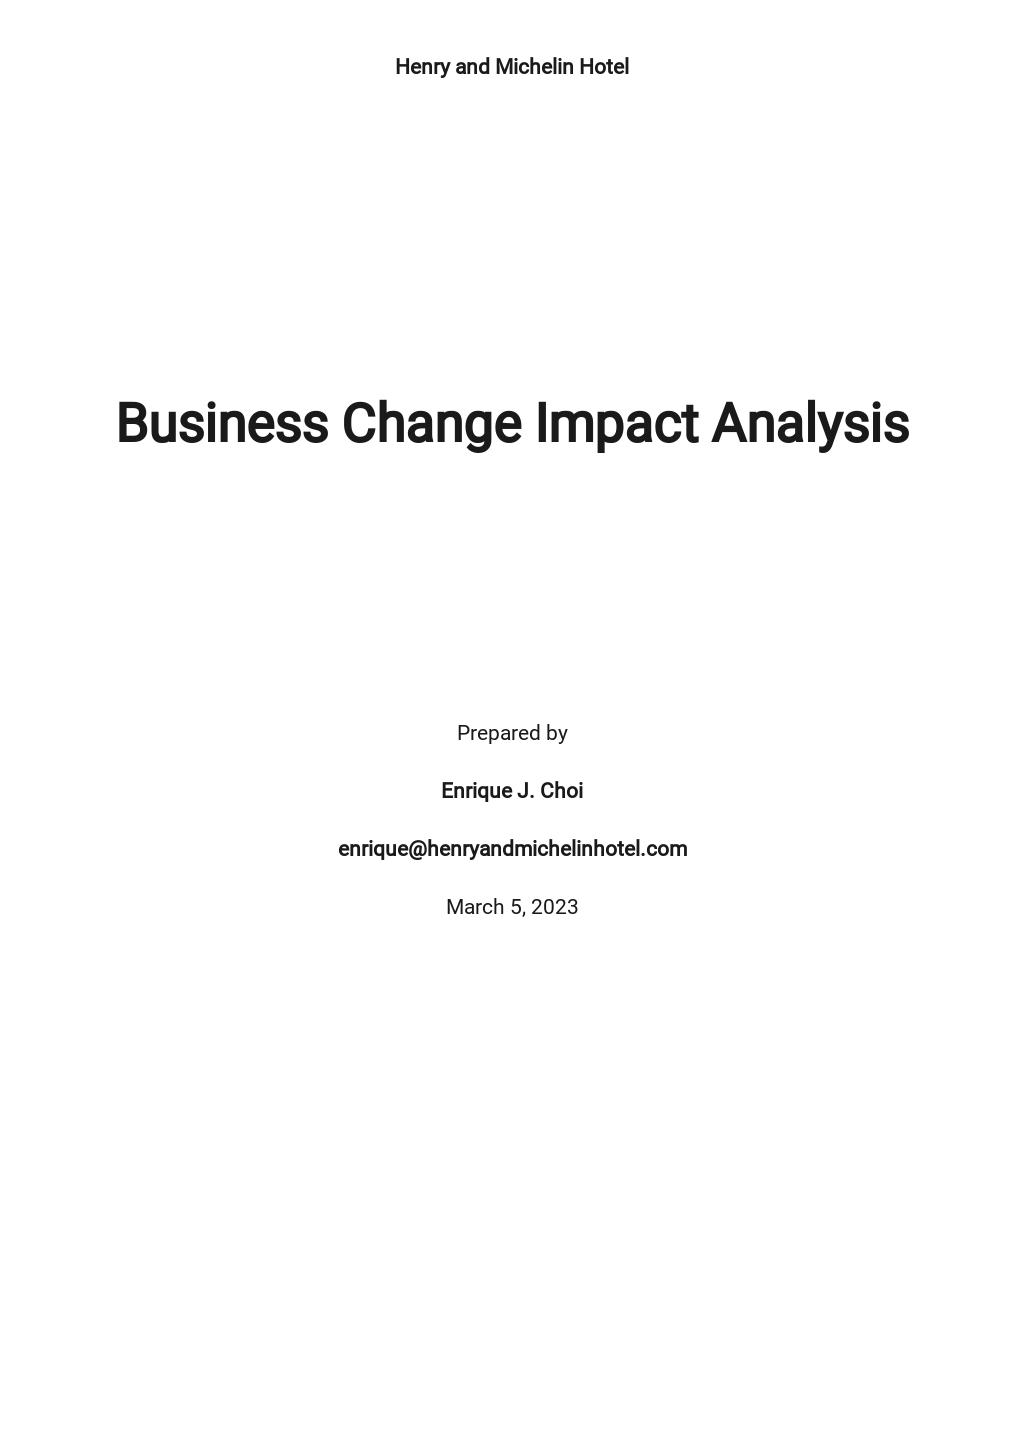 Business Change Impact Analysis Template